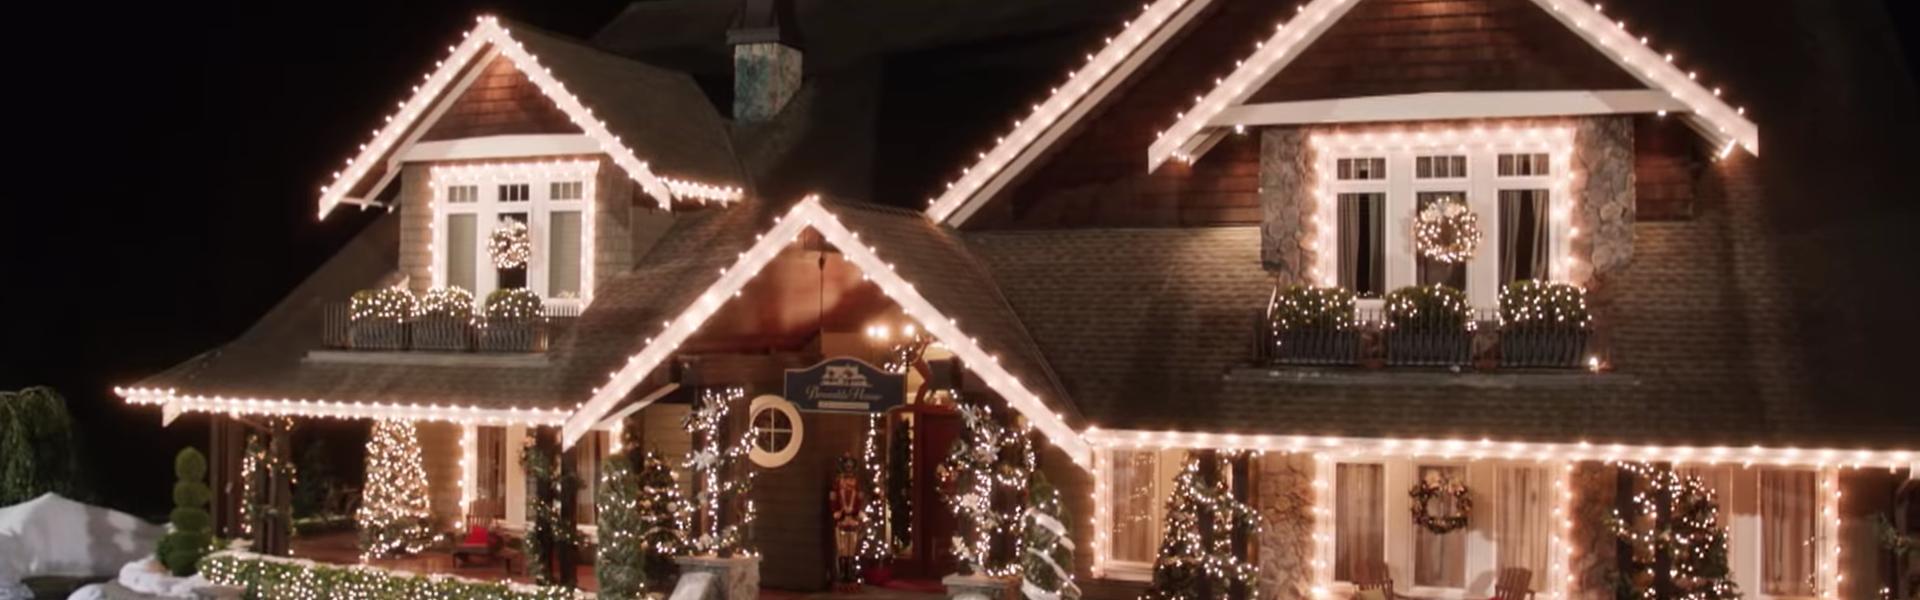 hallmark channel launches holiday home decoration contest daily brief by promaxbda promaxbda brief - Hallmark Christmas Home Decor